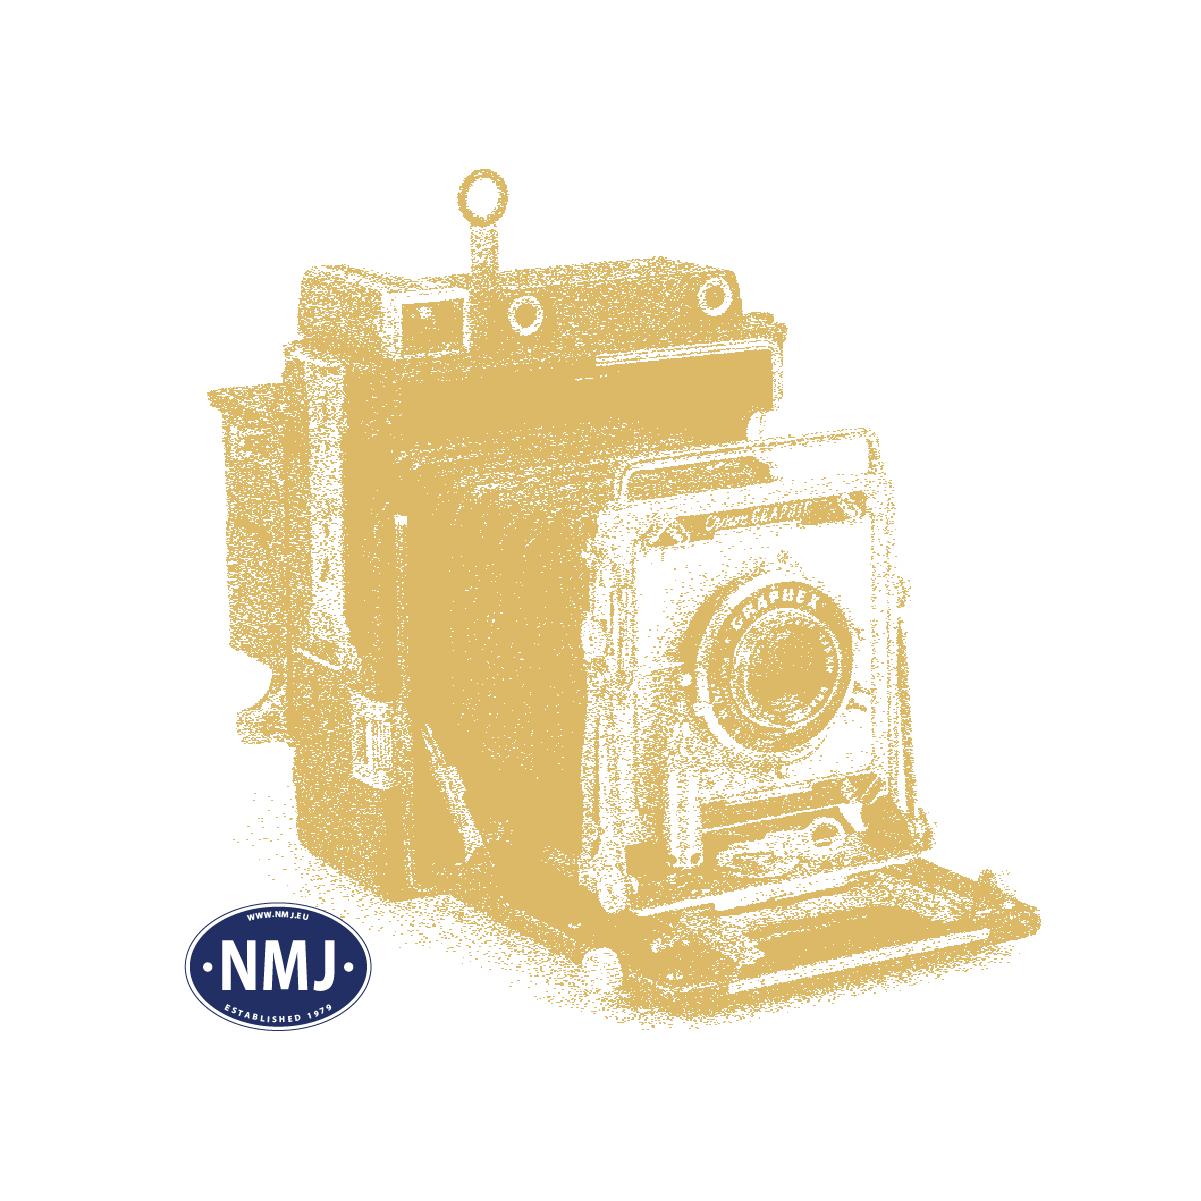 NMJT90016 - NMJ Topline NSB Di3a 618, Red/Black livery, DCC w/ Sound